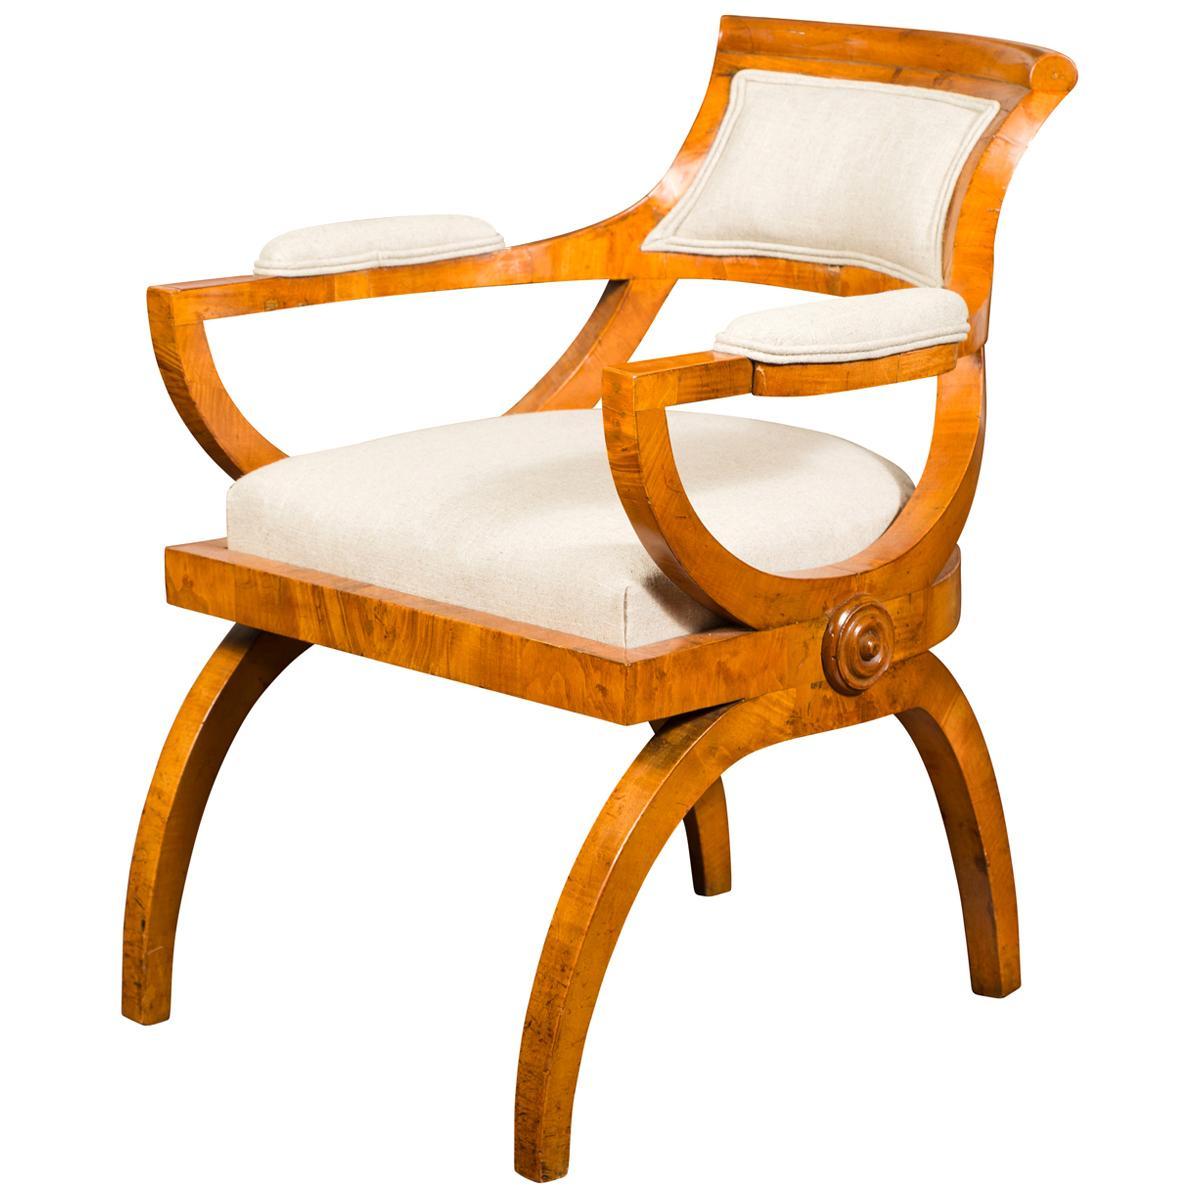 Austrian Biedermeier Style Walnut Armchair with New Upholstery, circa 1870